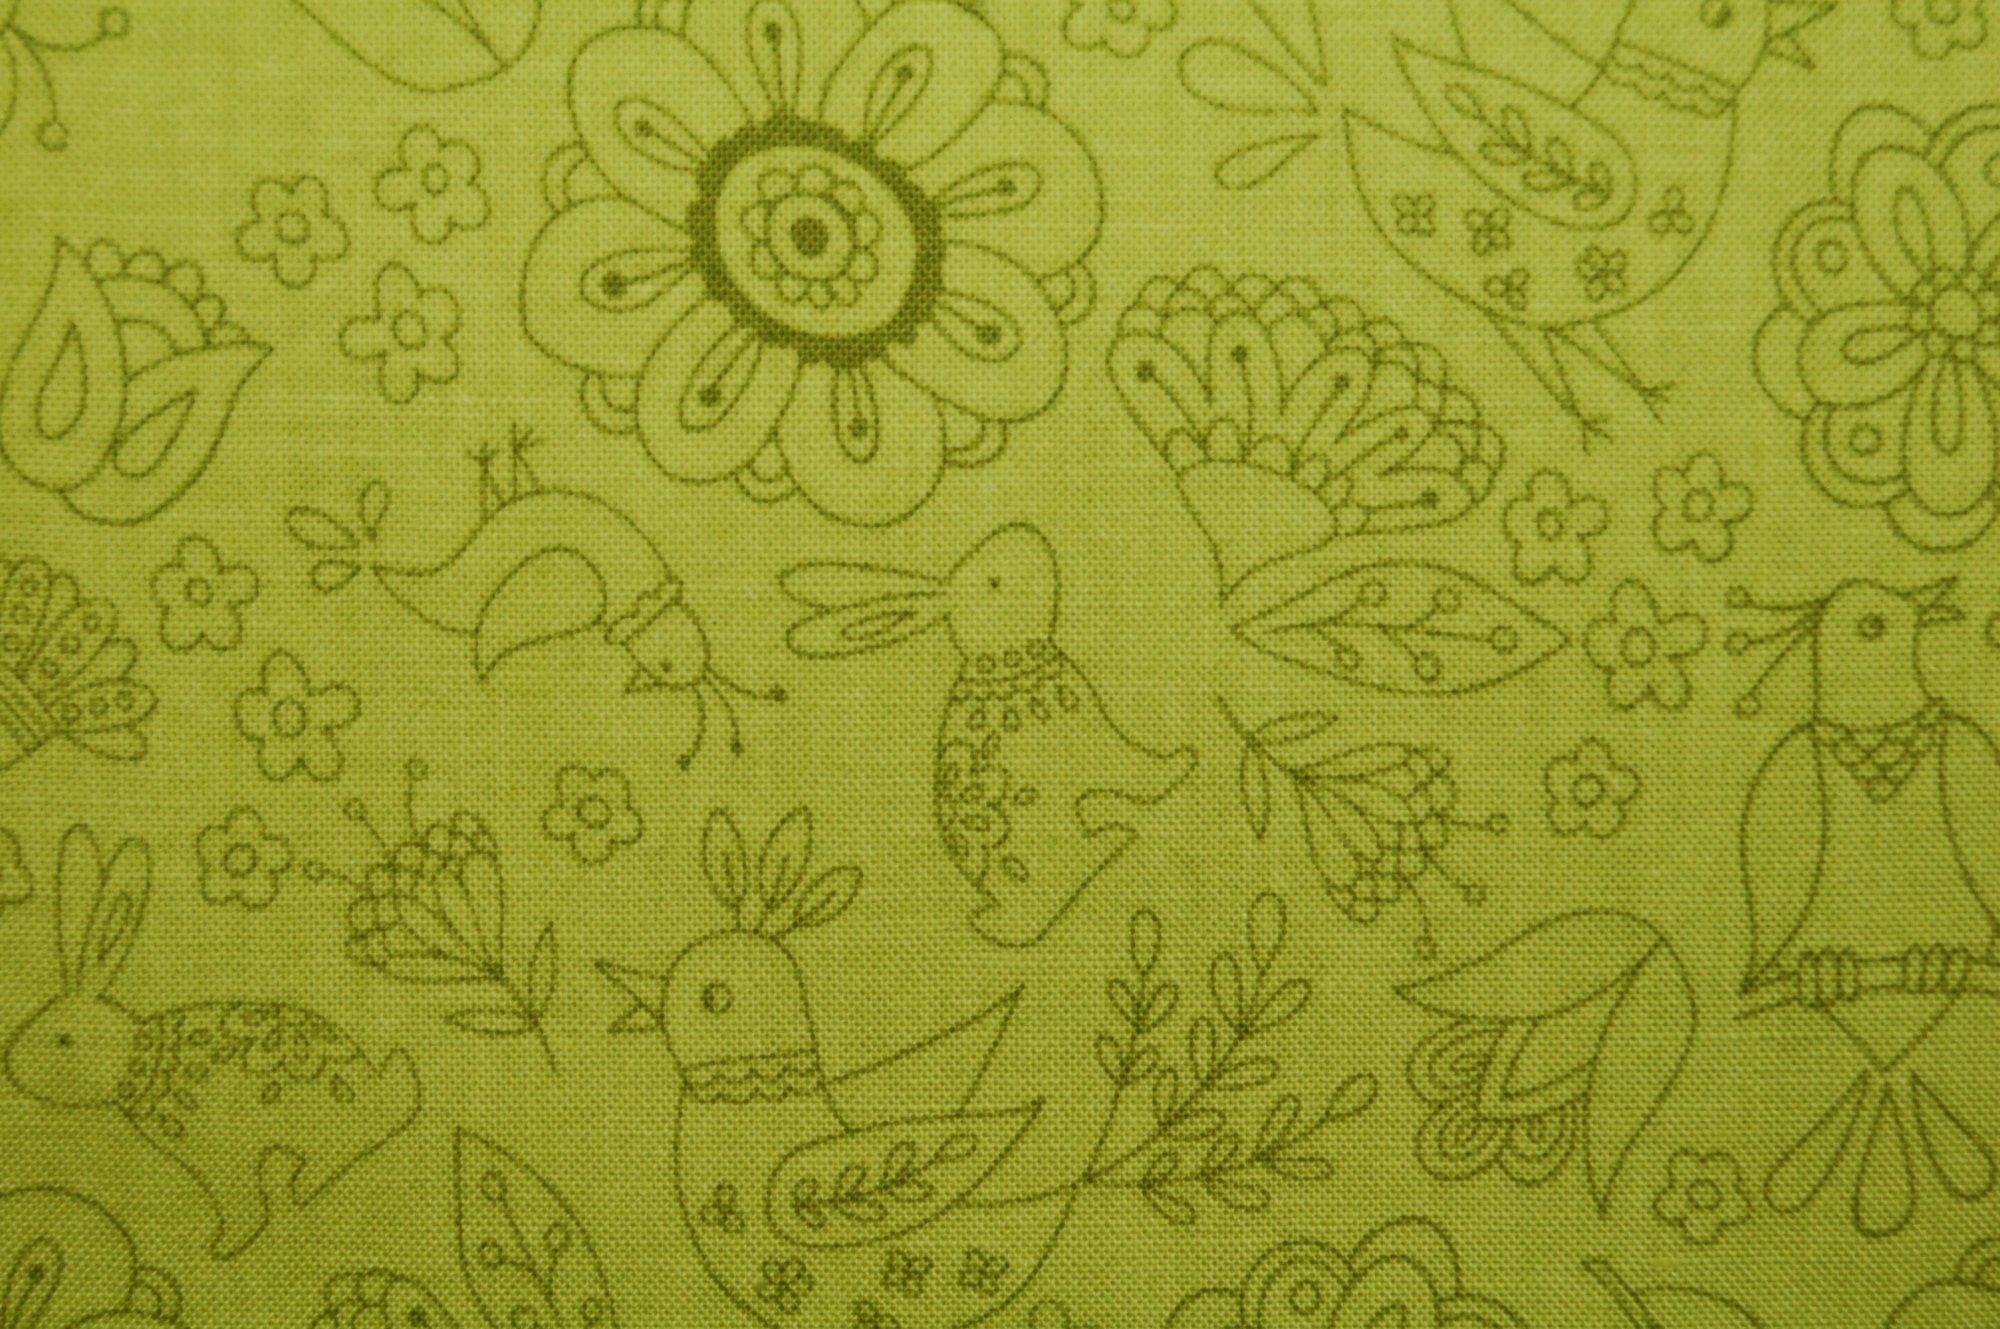 Dutch Treat - Floral by Betz White for Riley Blake Designs